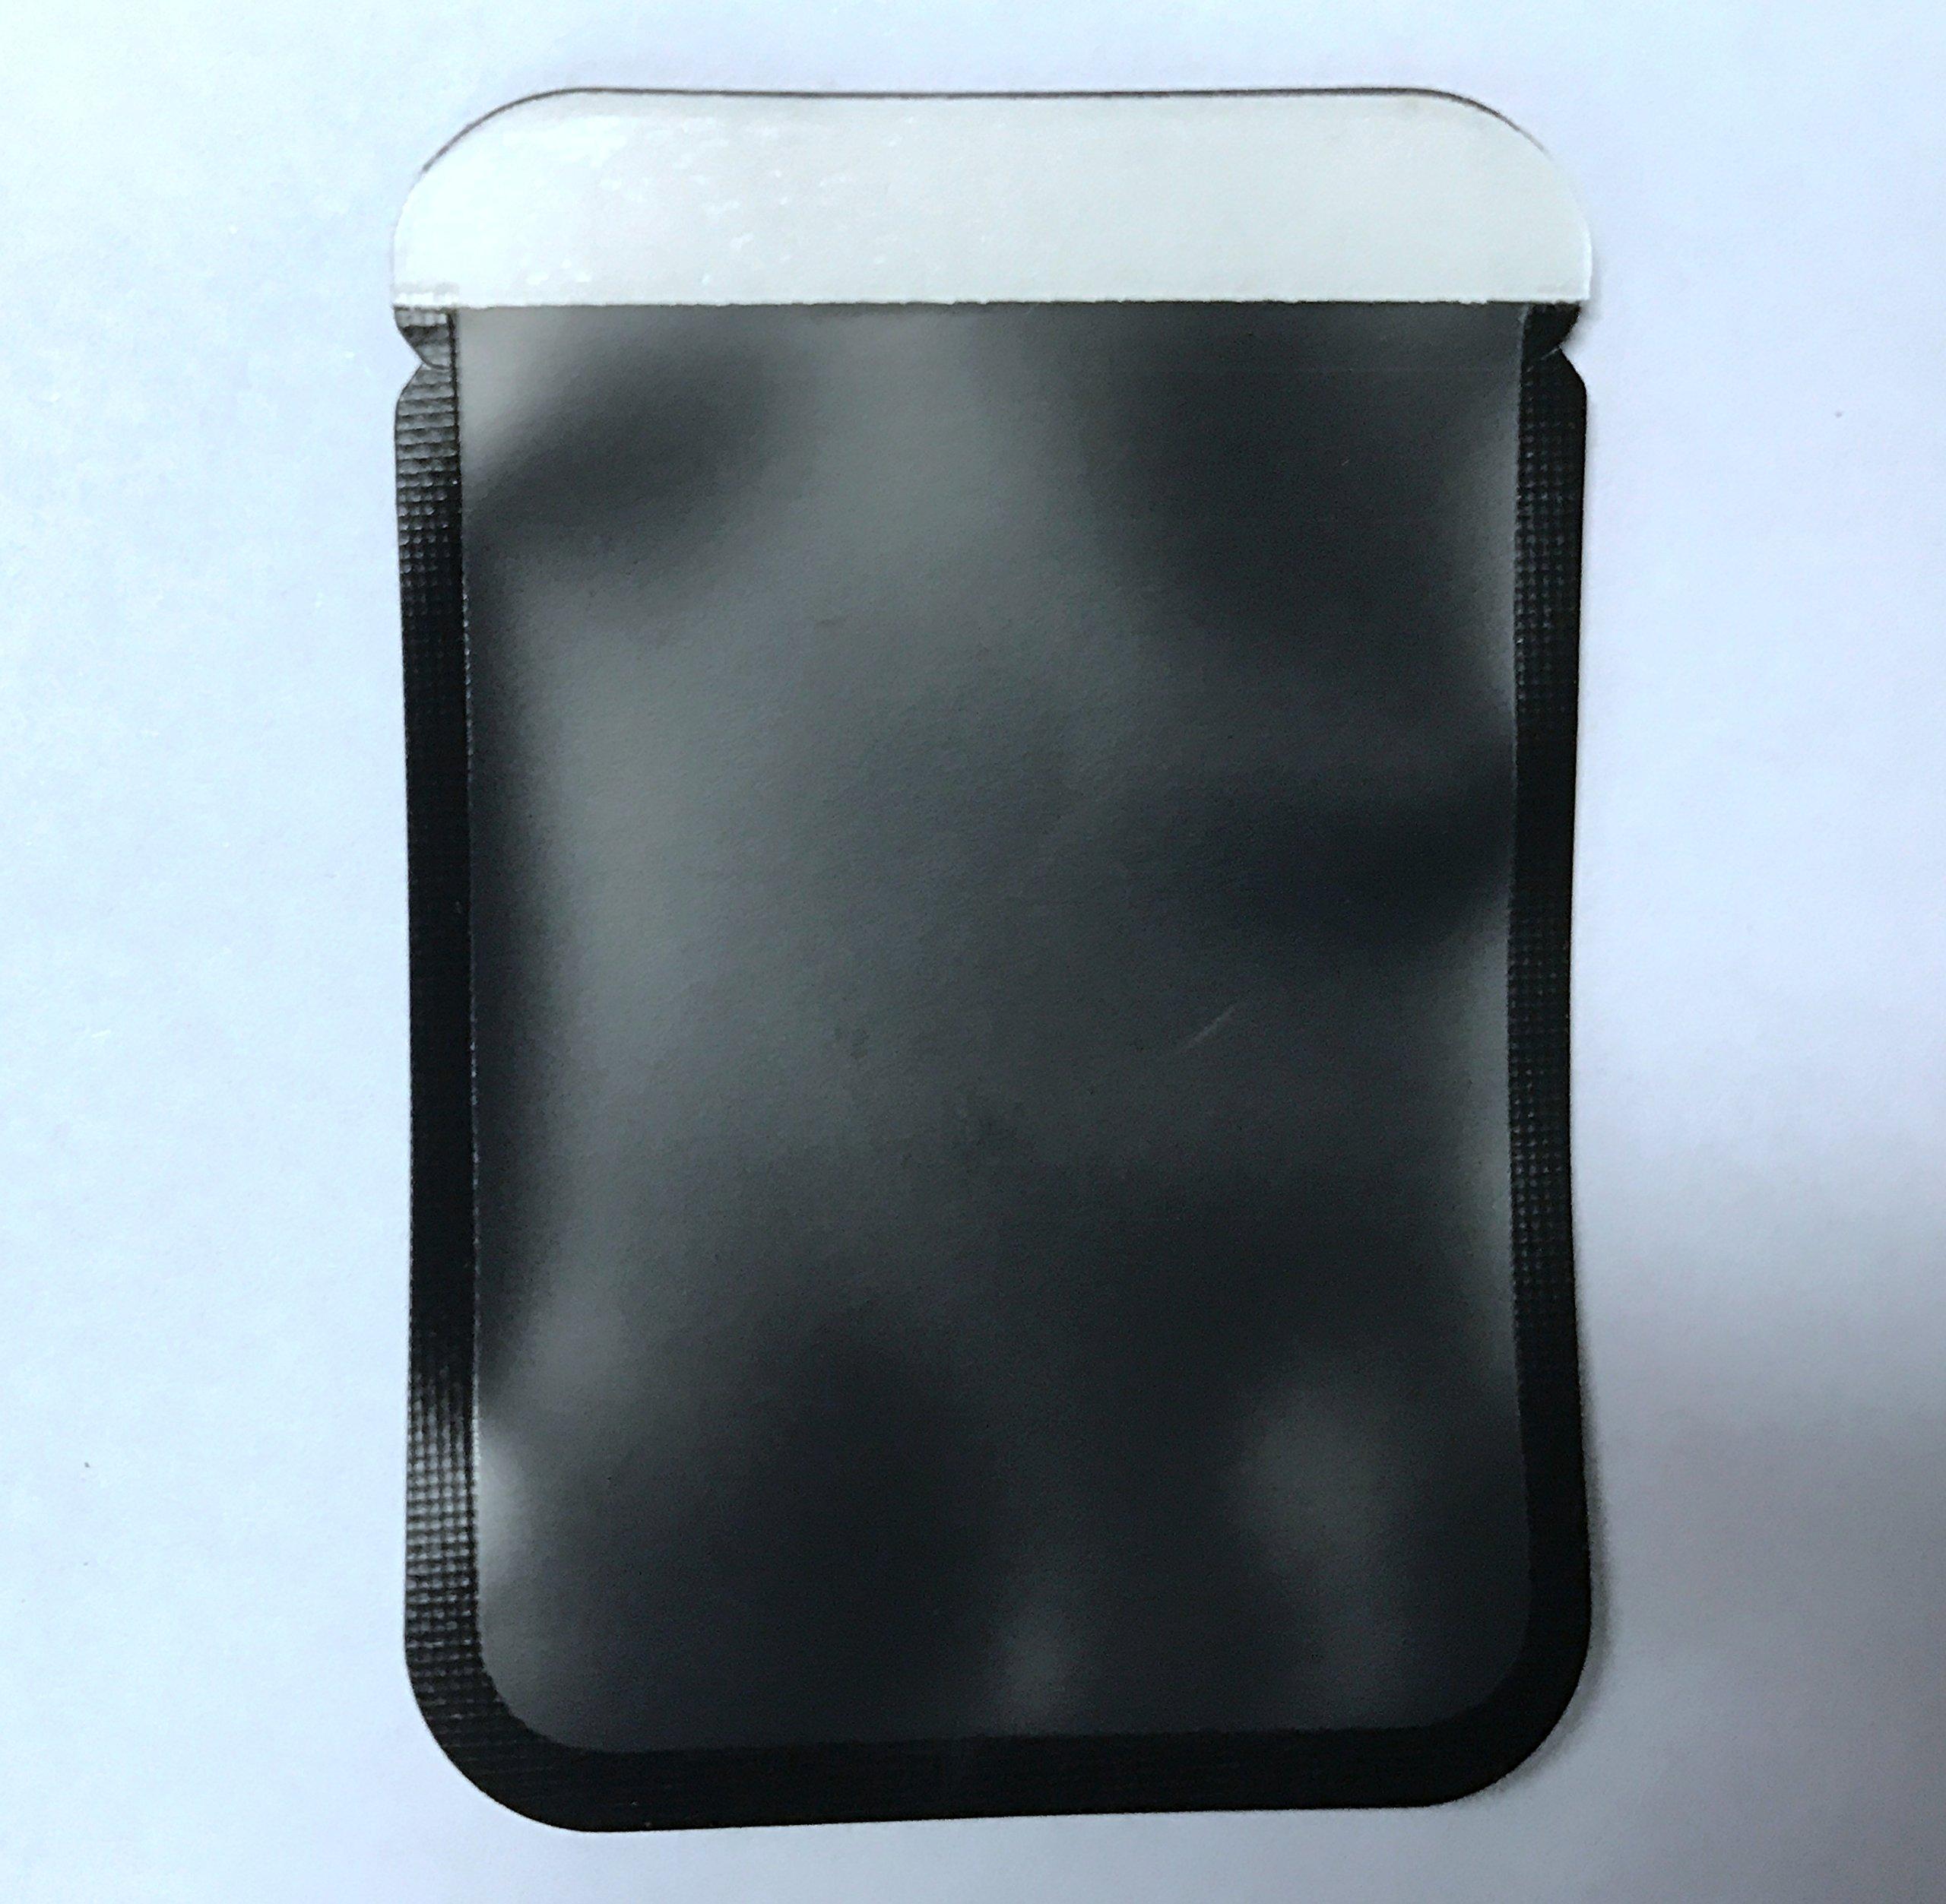 2000pcs PE #2 Dental X-Ray Barrier Envelopes for Phosphor Plate Side Tear Fed...